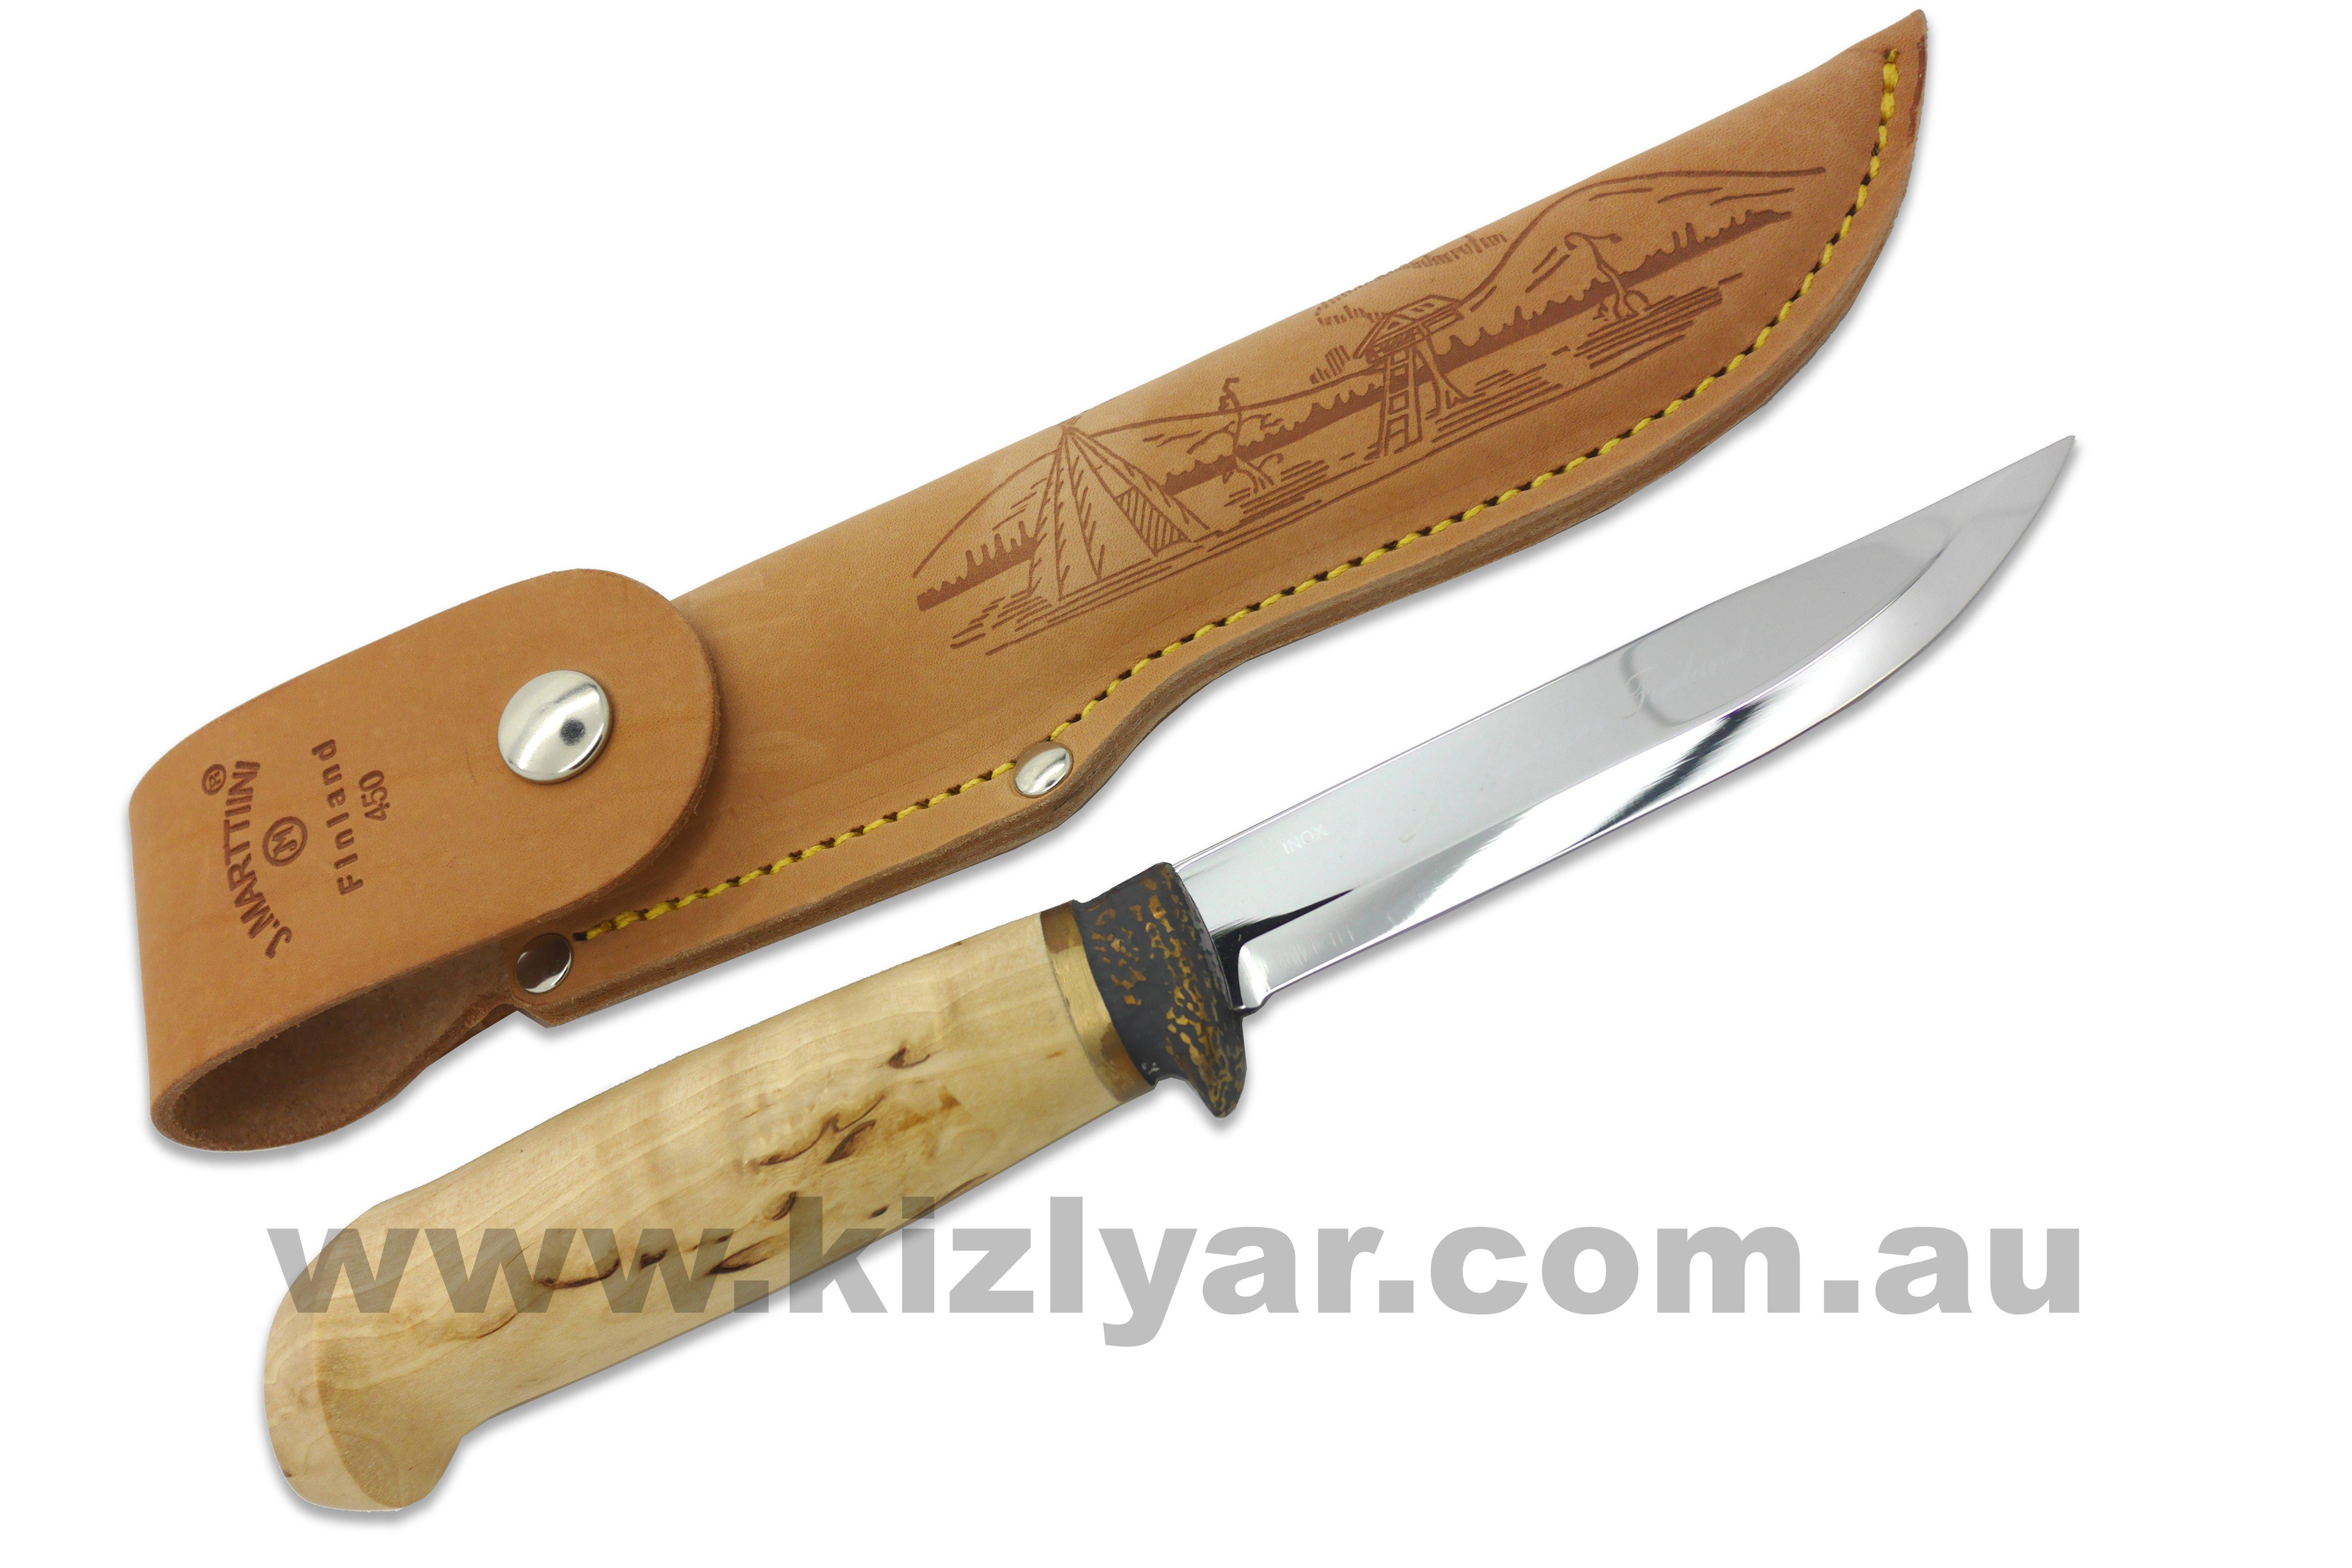 Marttiini Kizlyar Knives Australia, Knives and Outdoor Gear